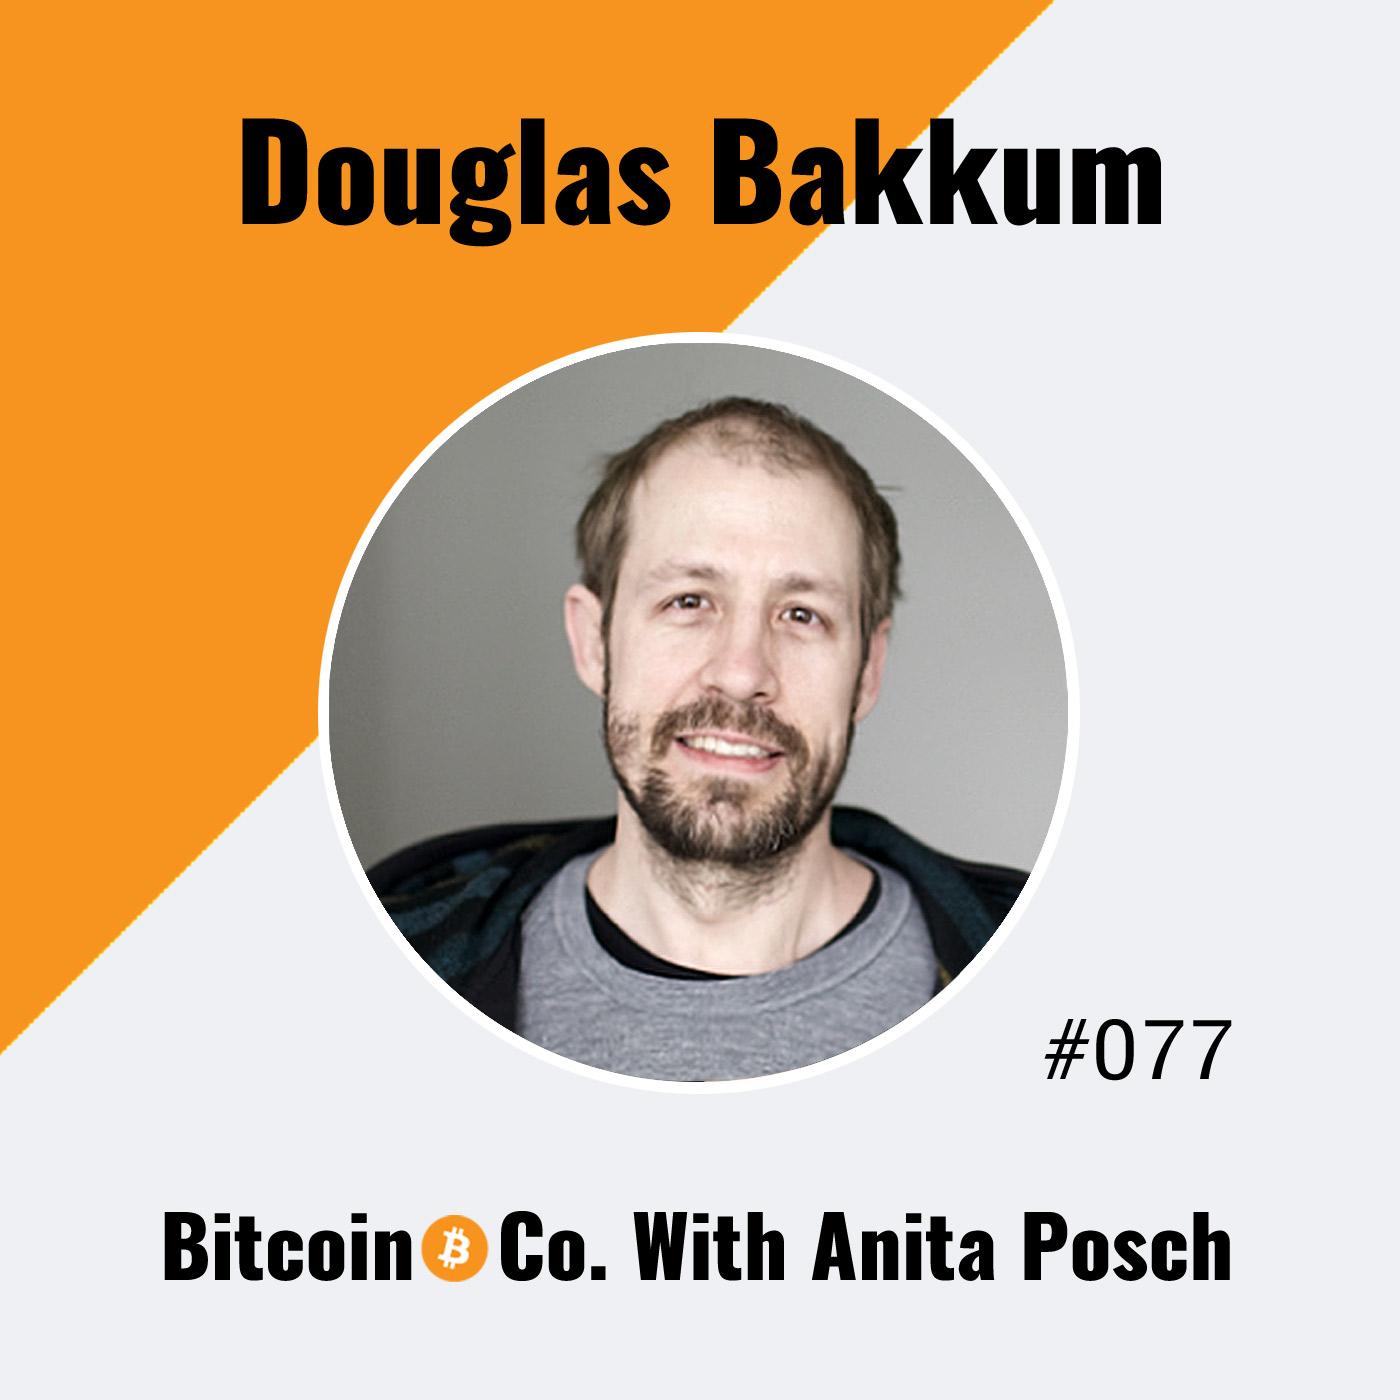 Douglas Bakkum: Building Bitcoin Hardware Wallets to Empower Individuals